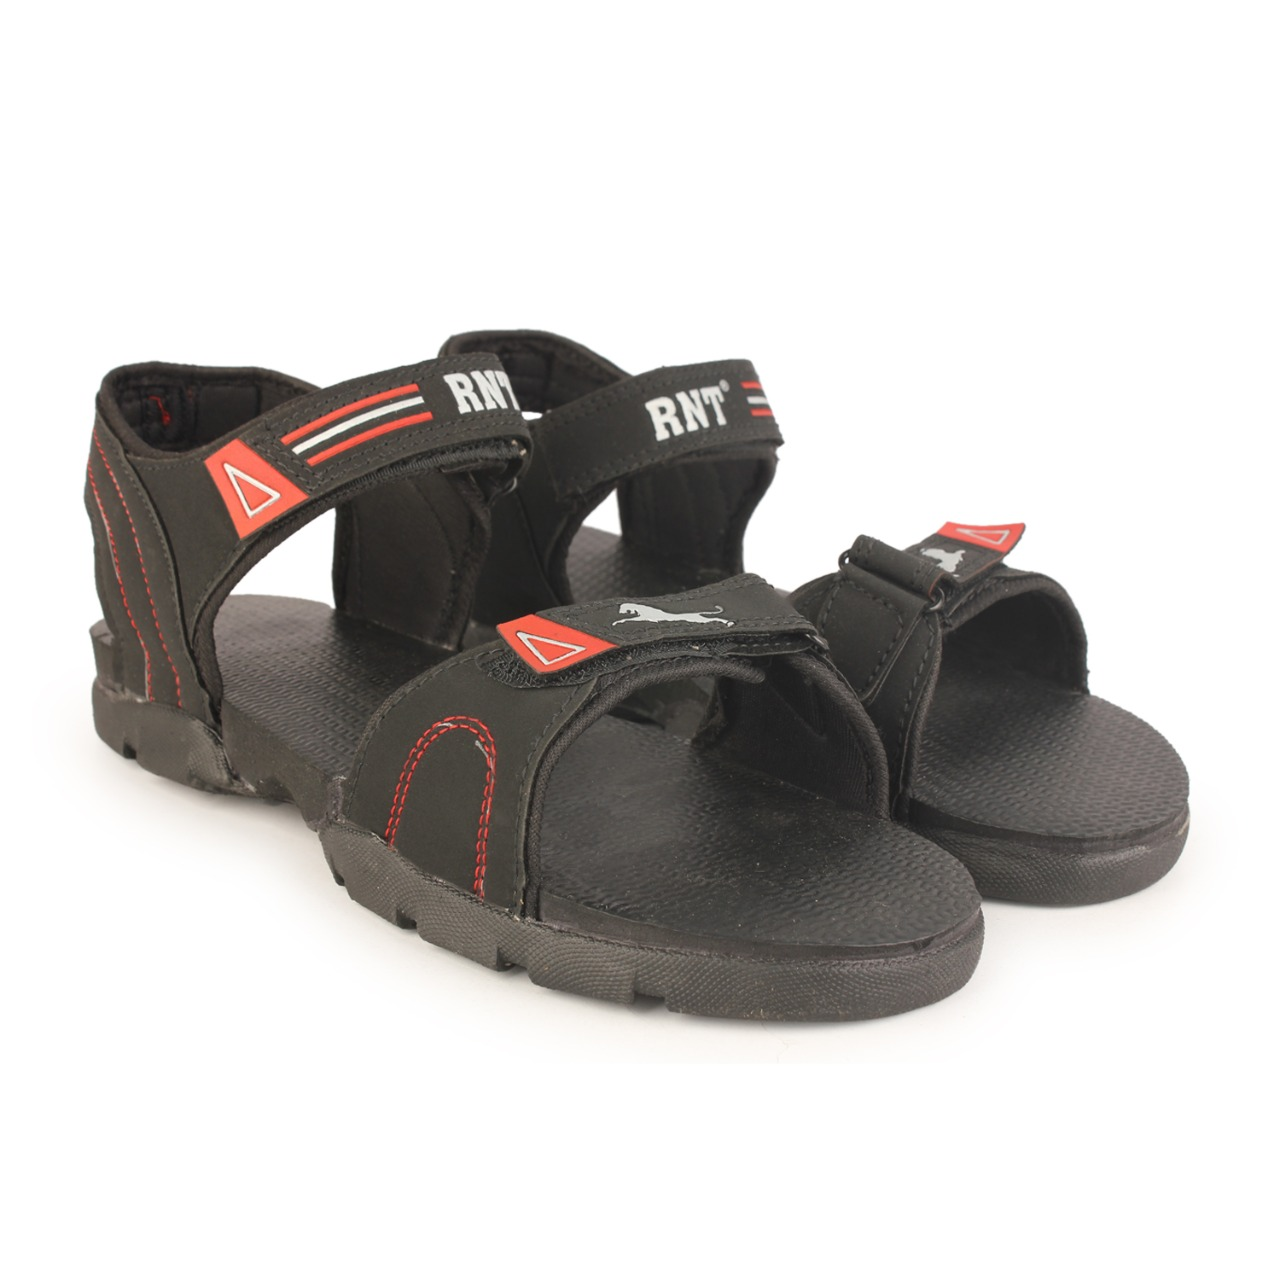 RNT | RNT New Fashionable Sandals for Men